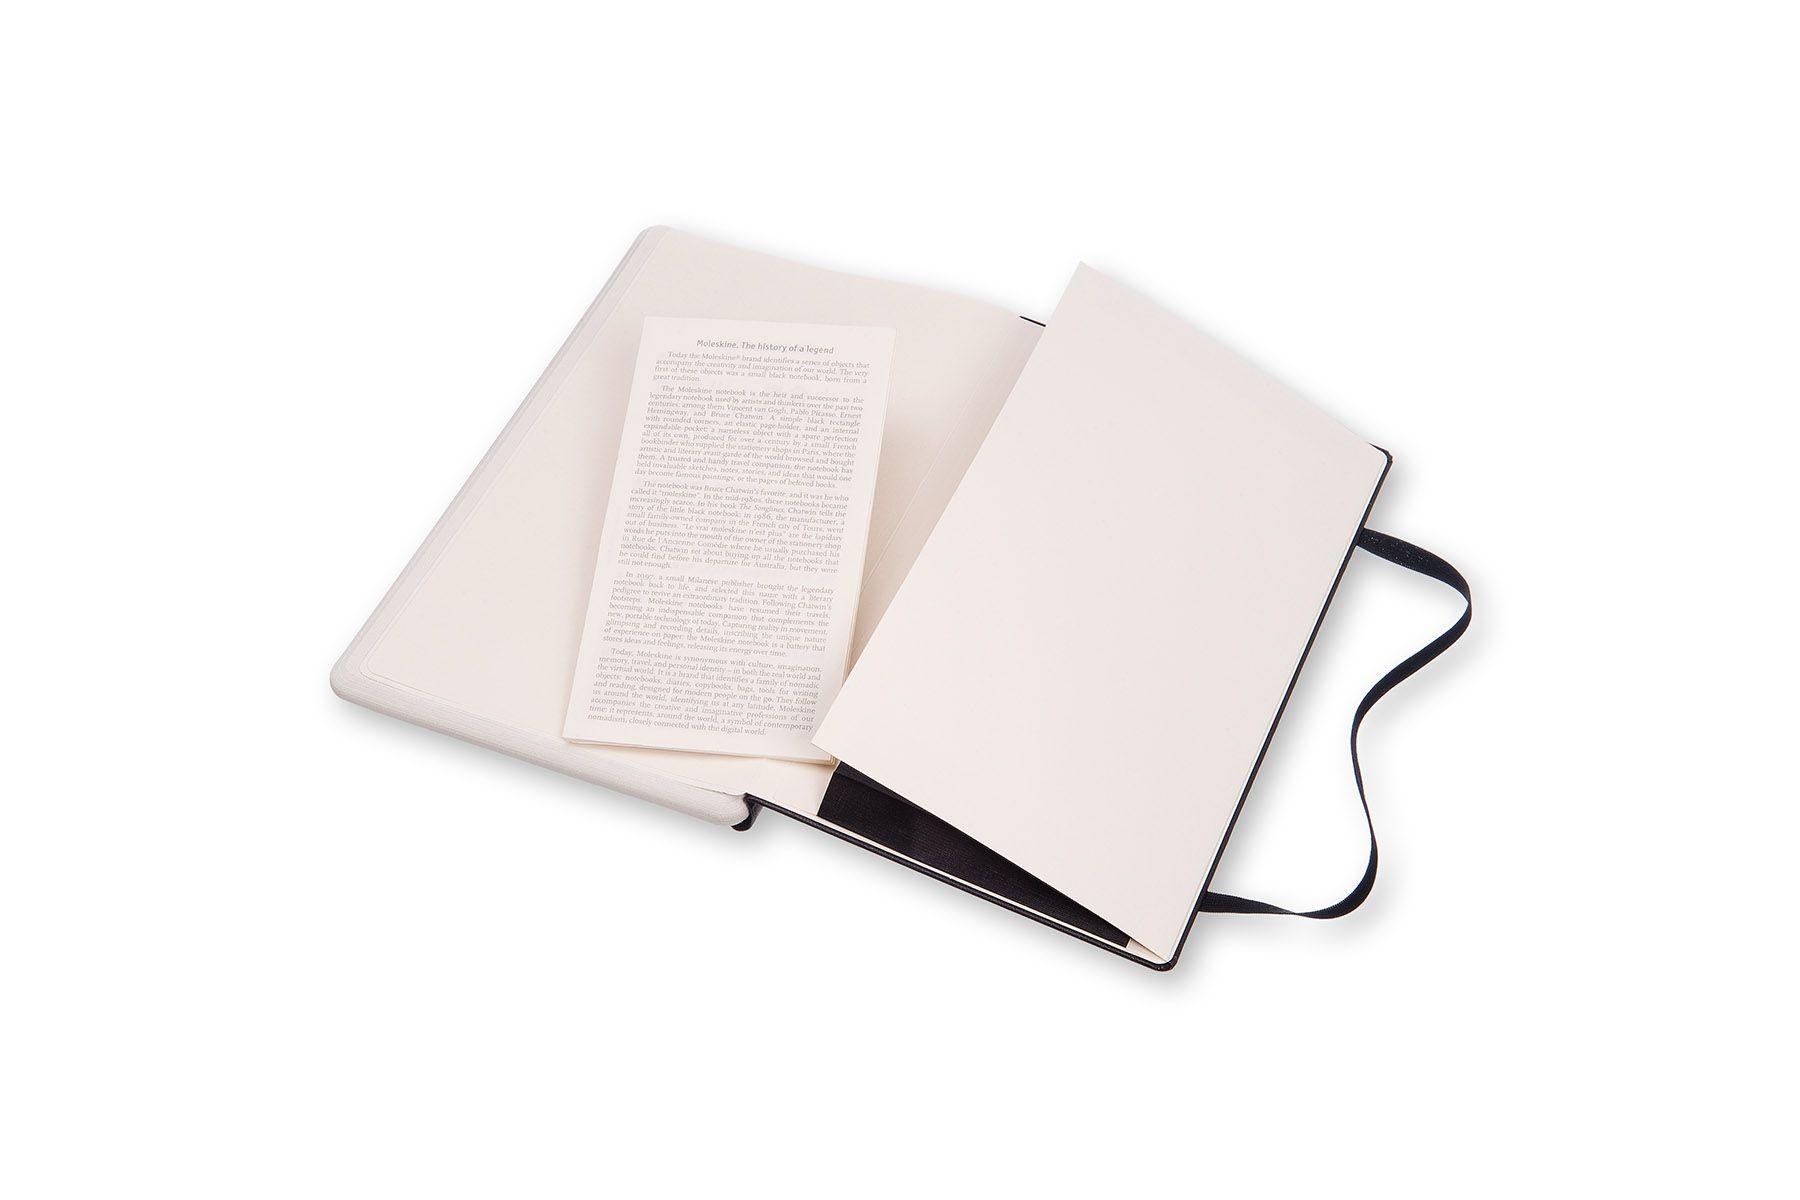 Conjunto Moleskine Smart Writing Set